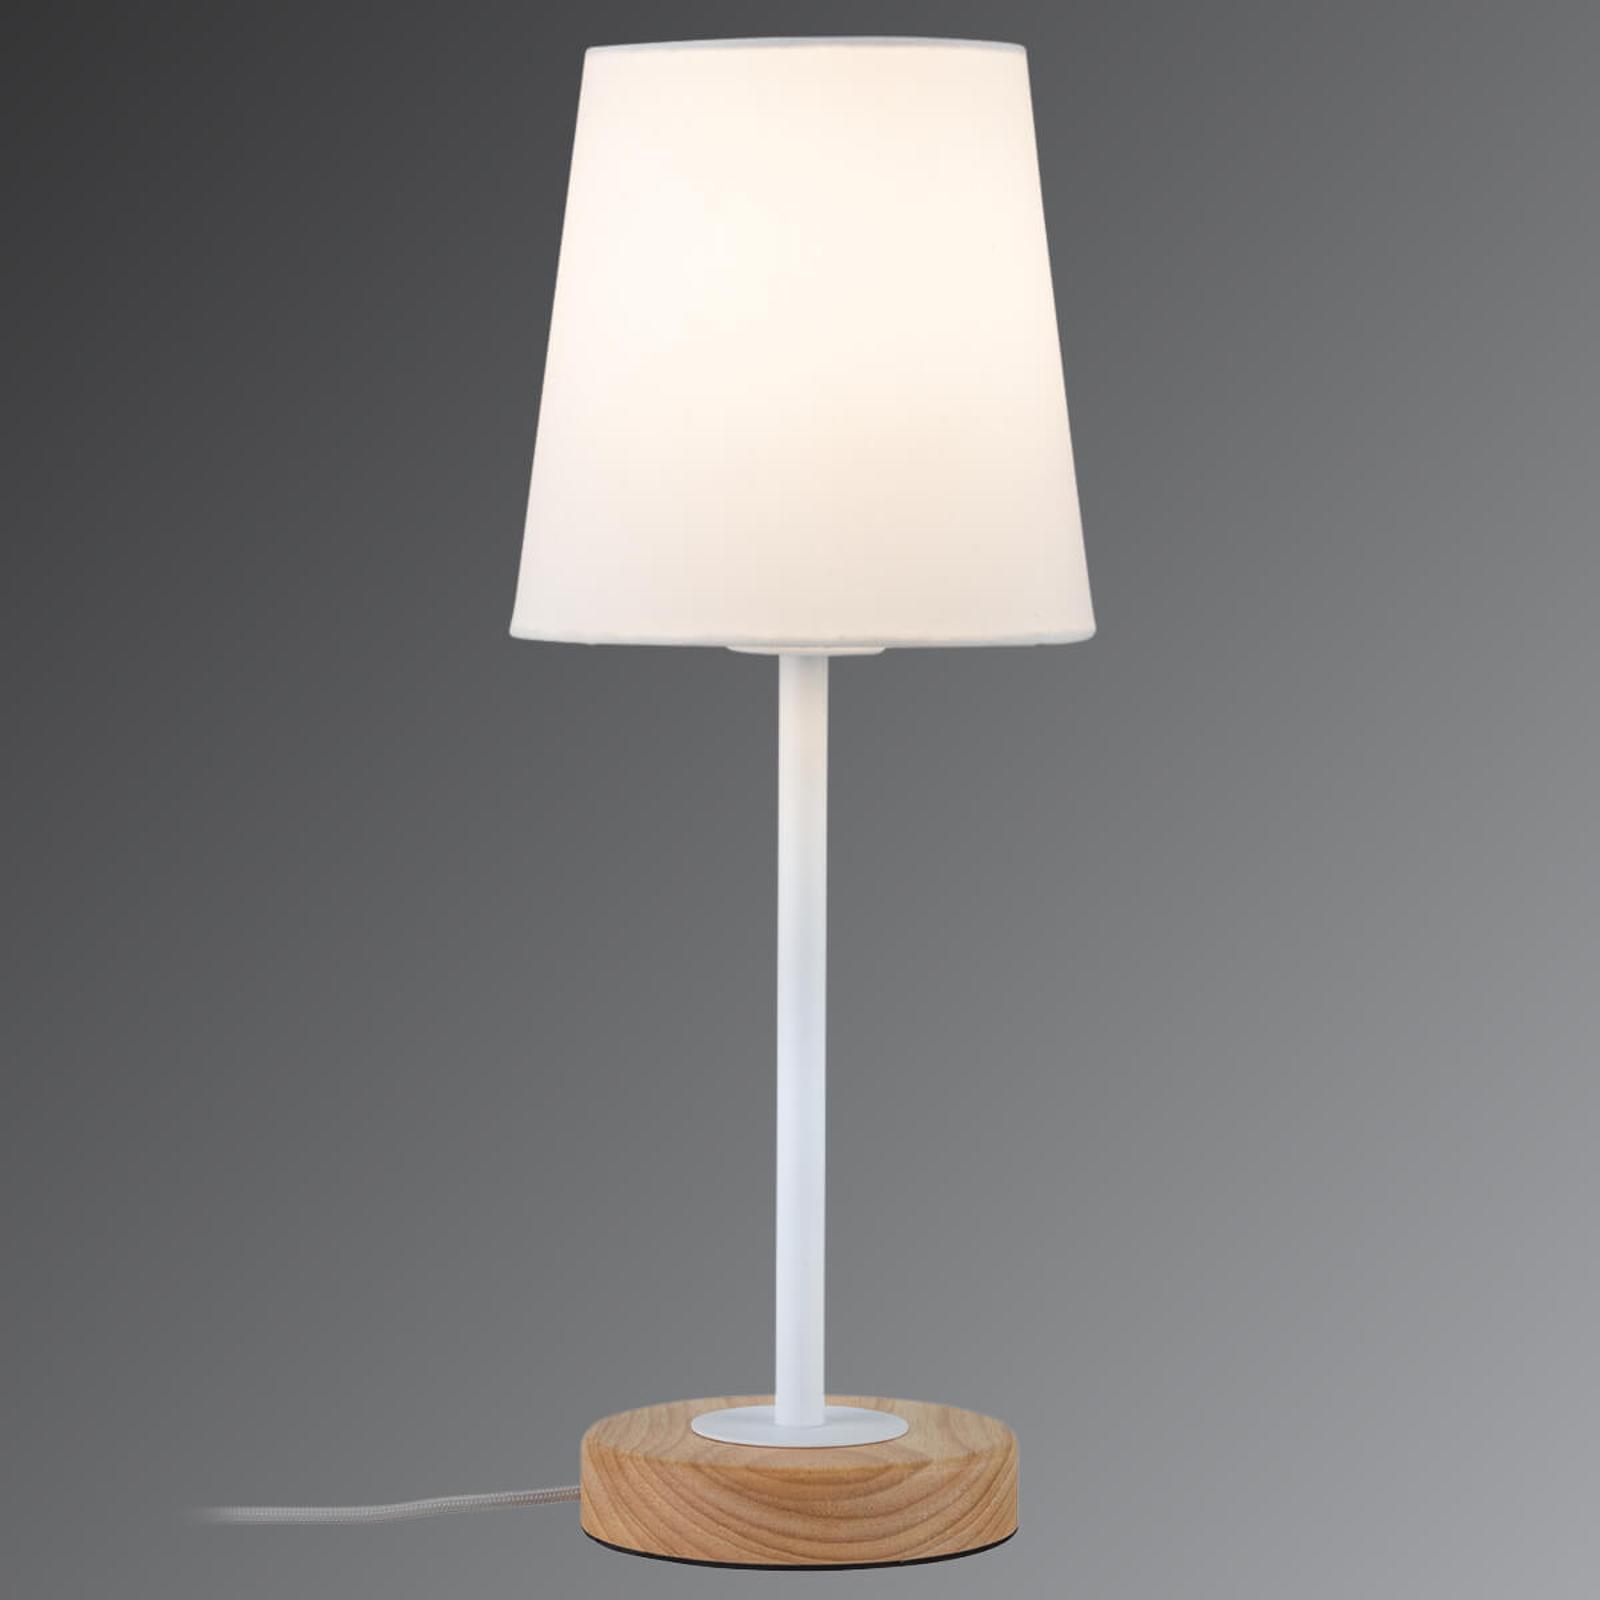 Natuurlijk ontworpen textiele tafellamp Stellan